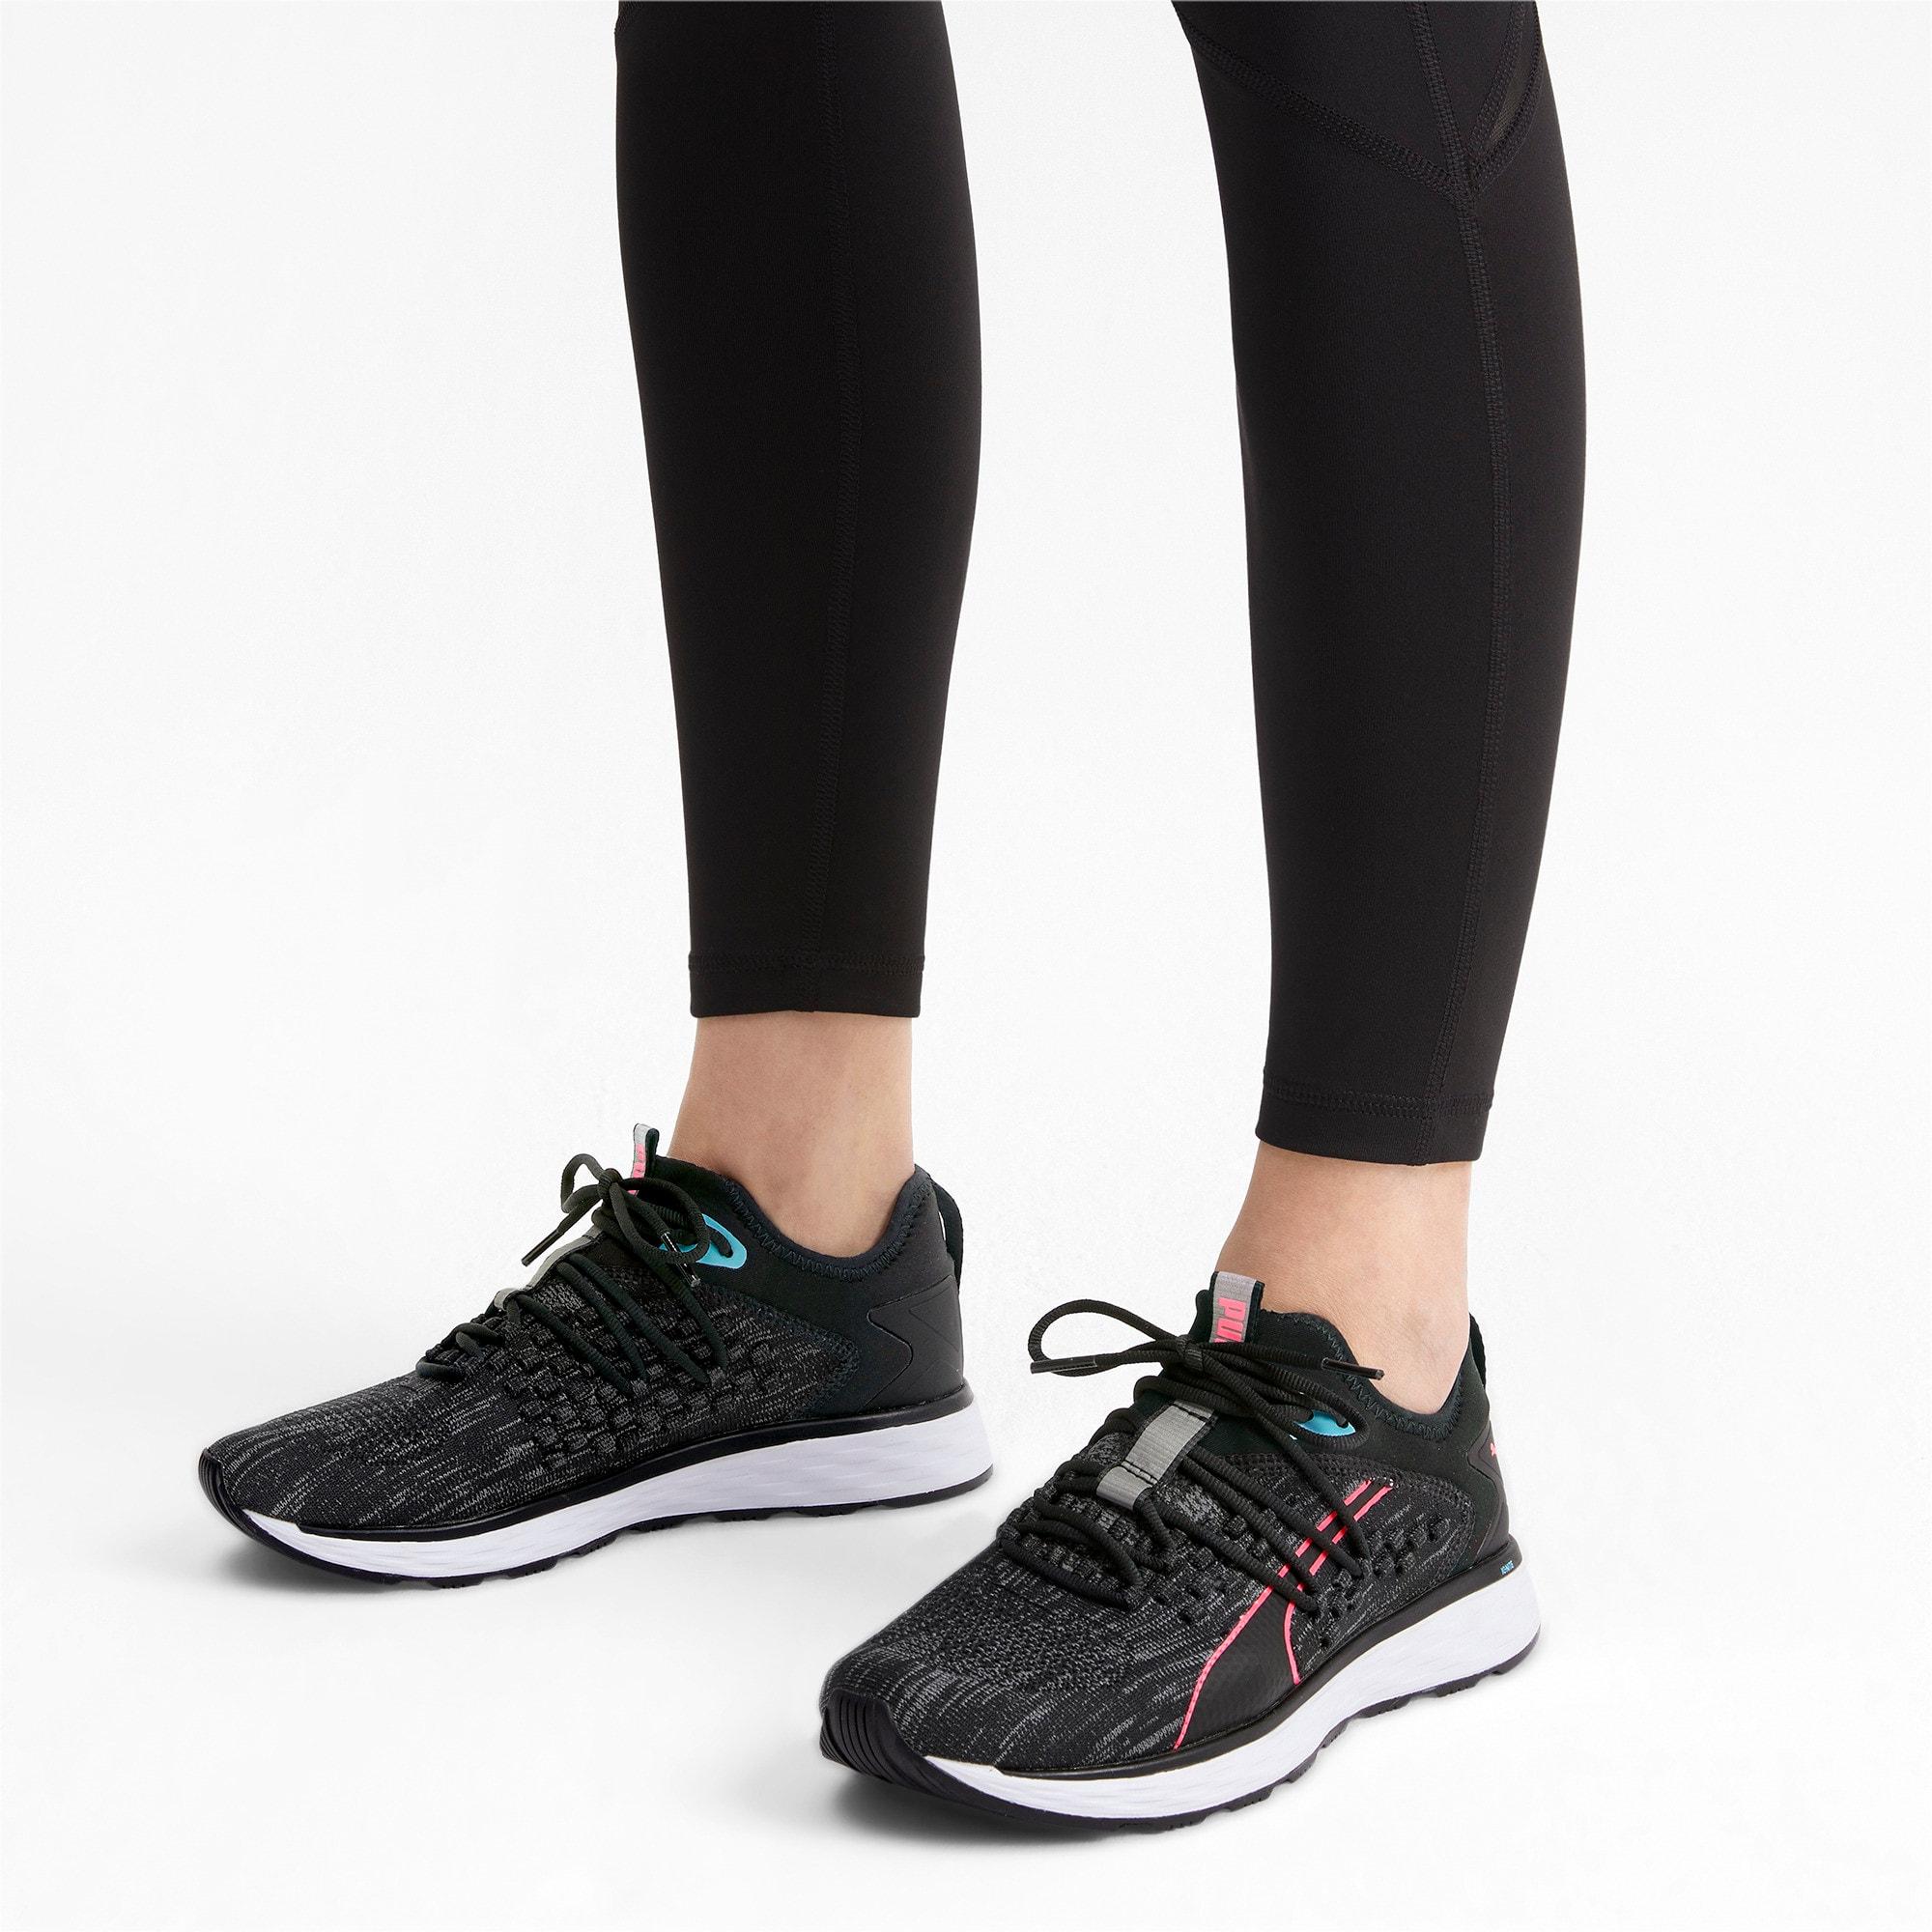 Thumbnail 2 of SPEED FUSEFIT Women's Running Shoes, Puma Black-Milky Blue, medium-IND